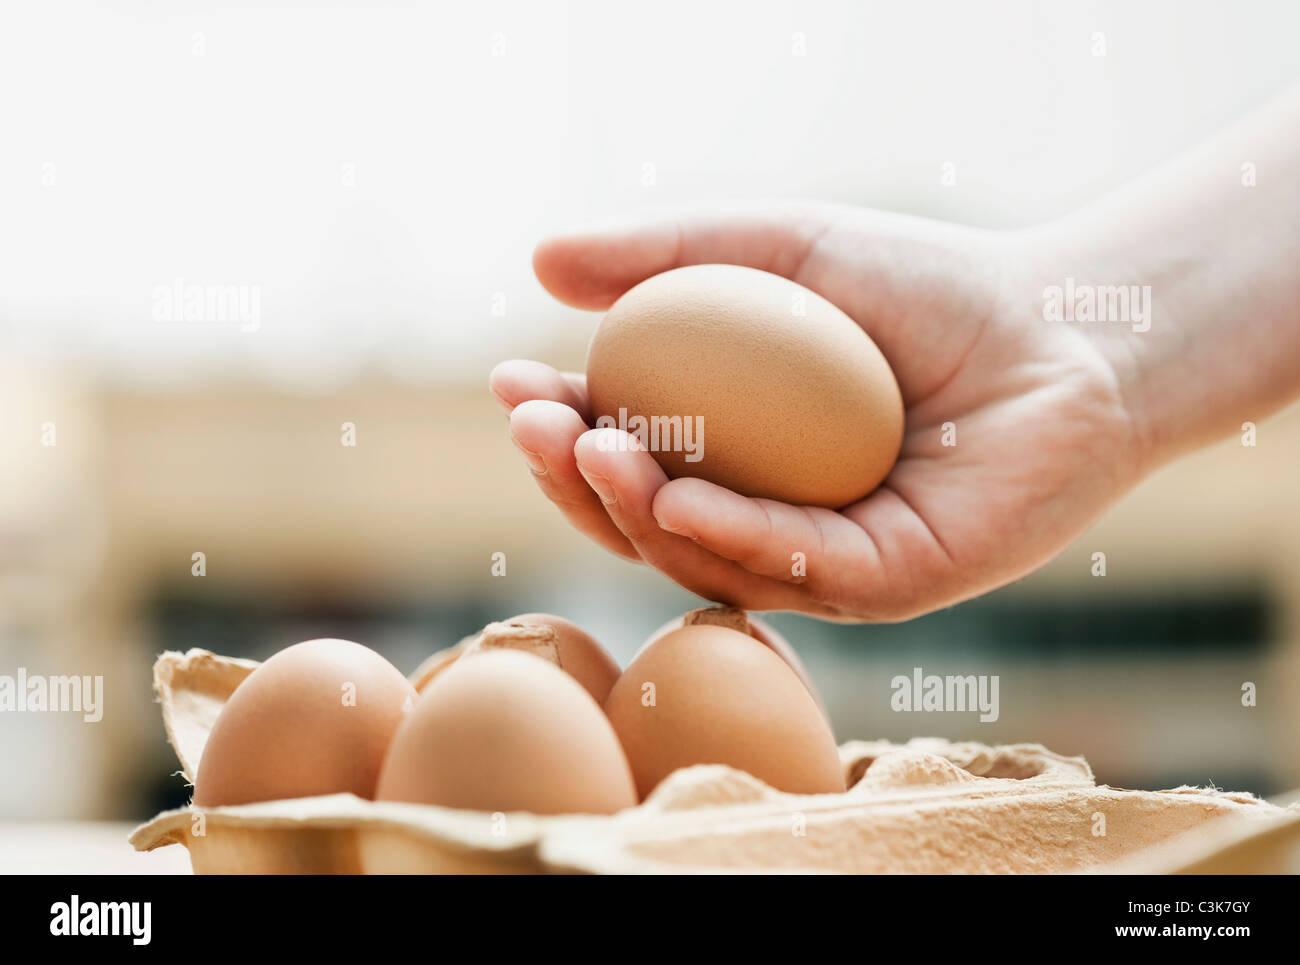 Germania, Colonia, mano umana tenendo le uova, close up Immagini Stock